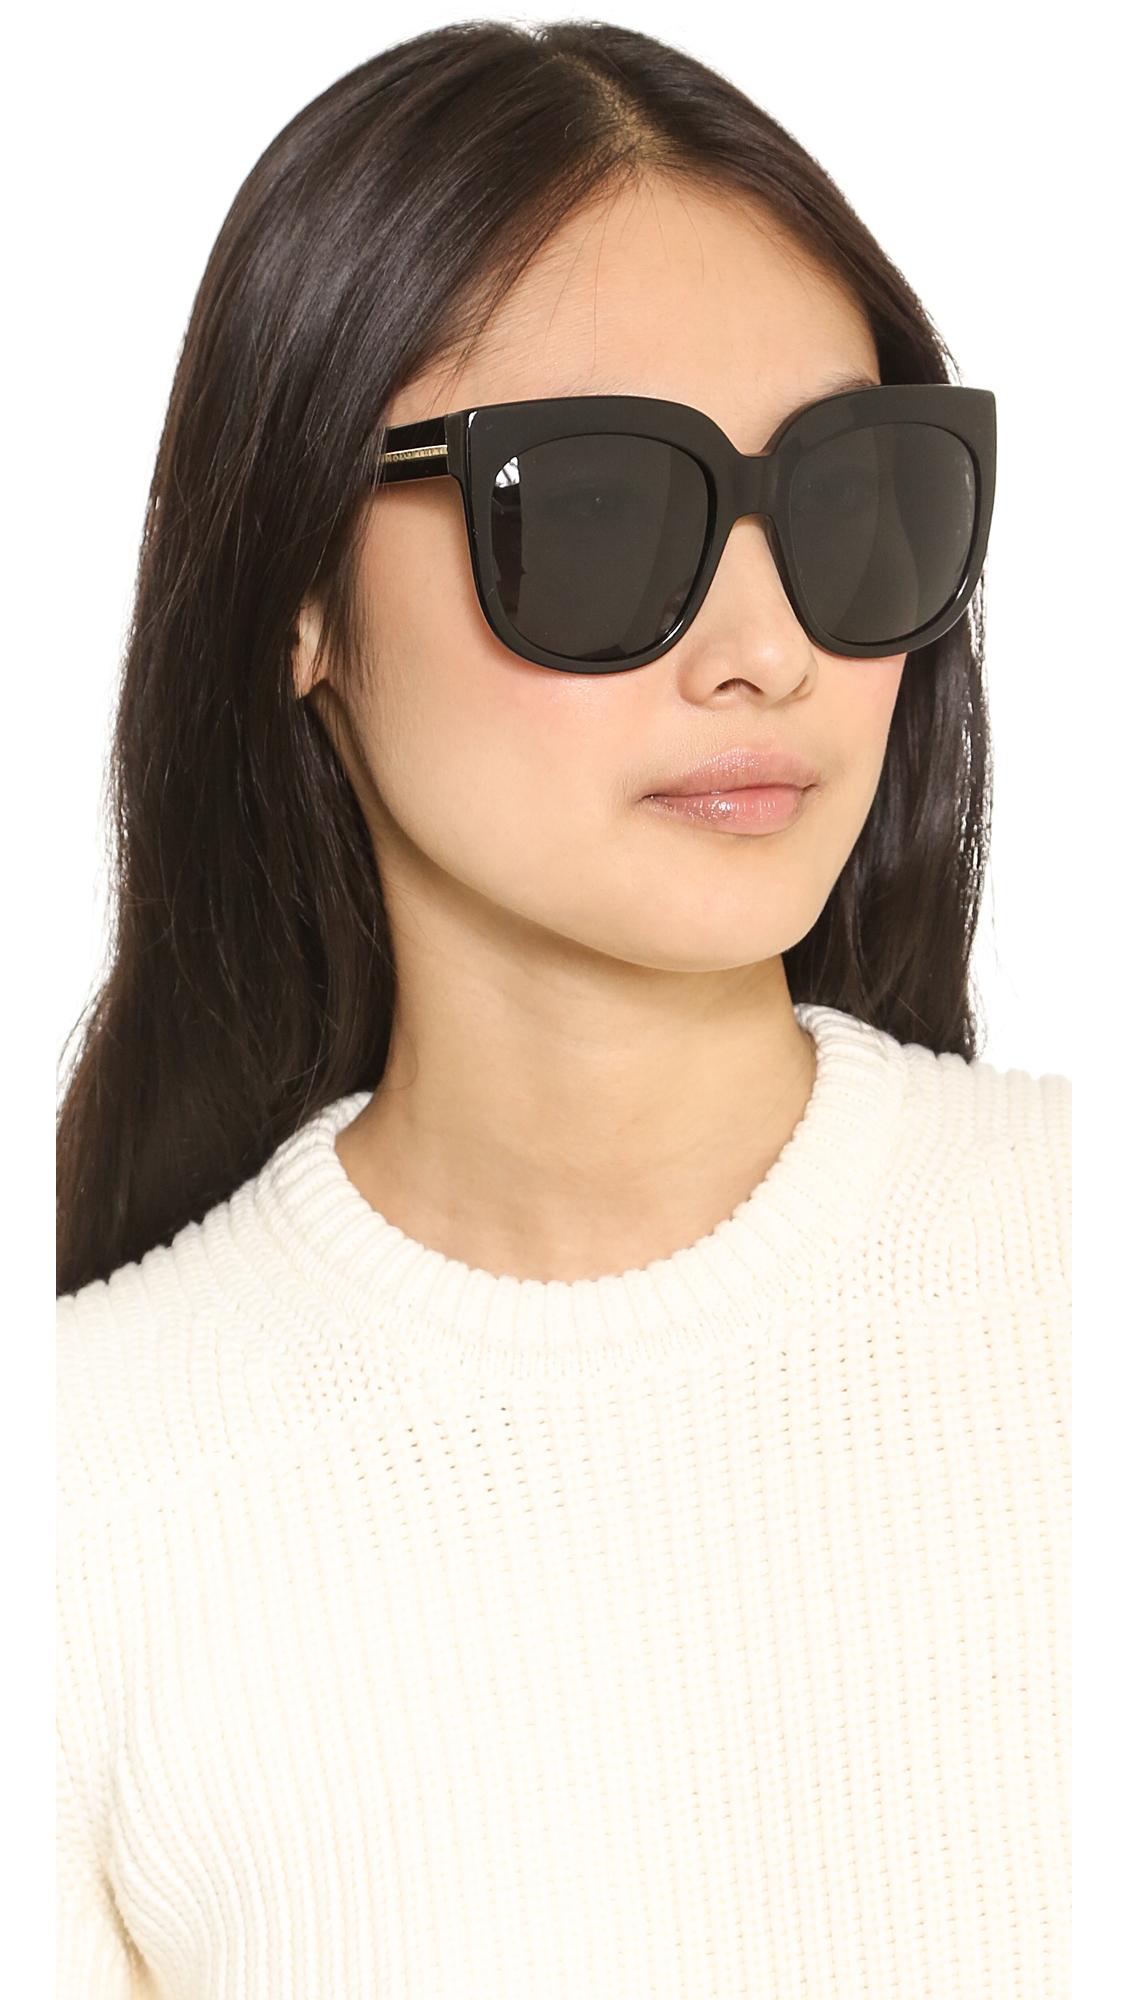 1e93a6f4b8c Lyst - Stella McCartney Oversized Sunglasses - Nude Brown in Black